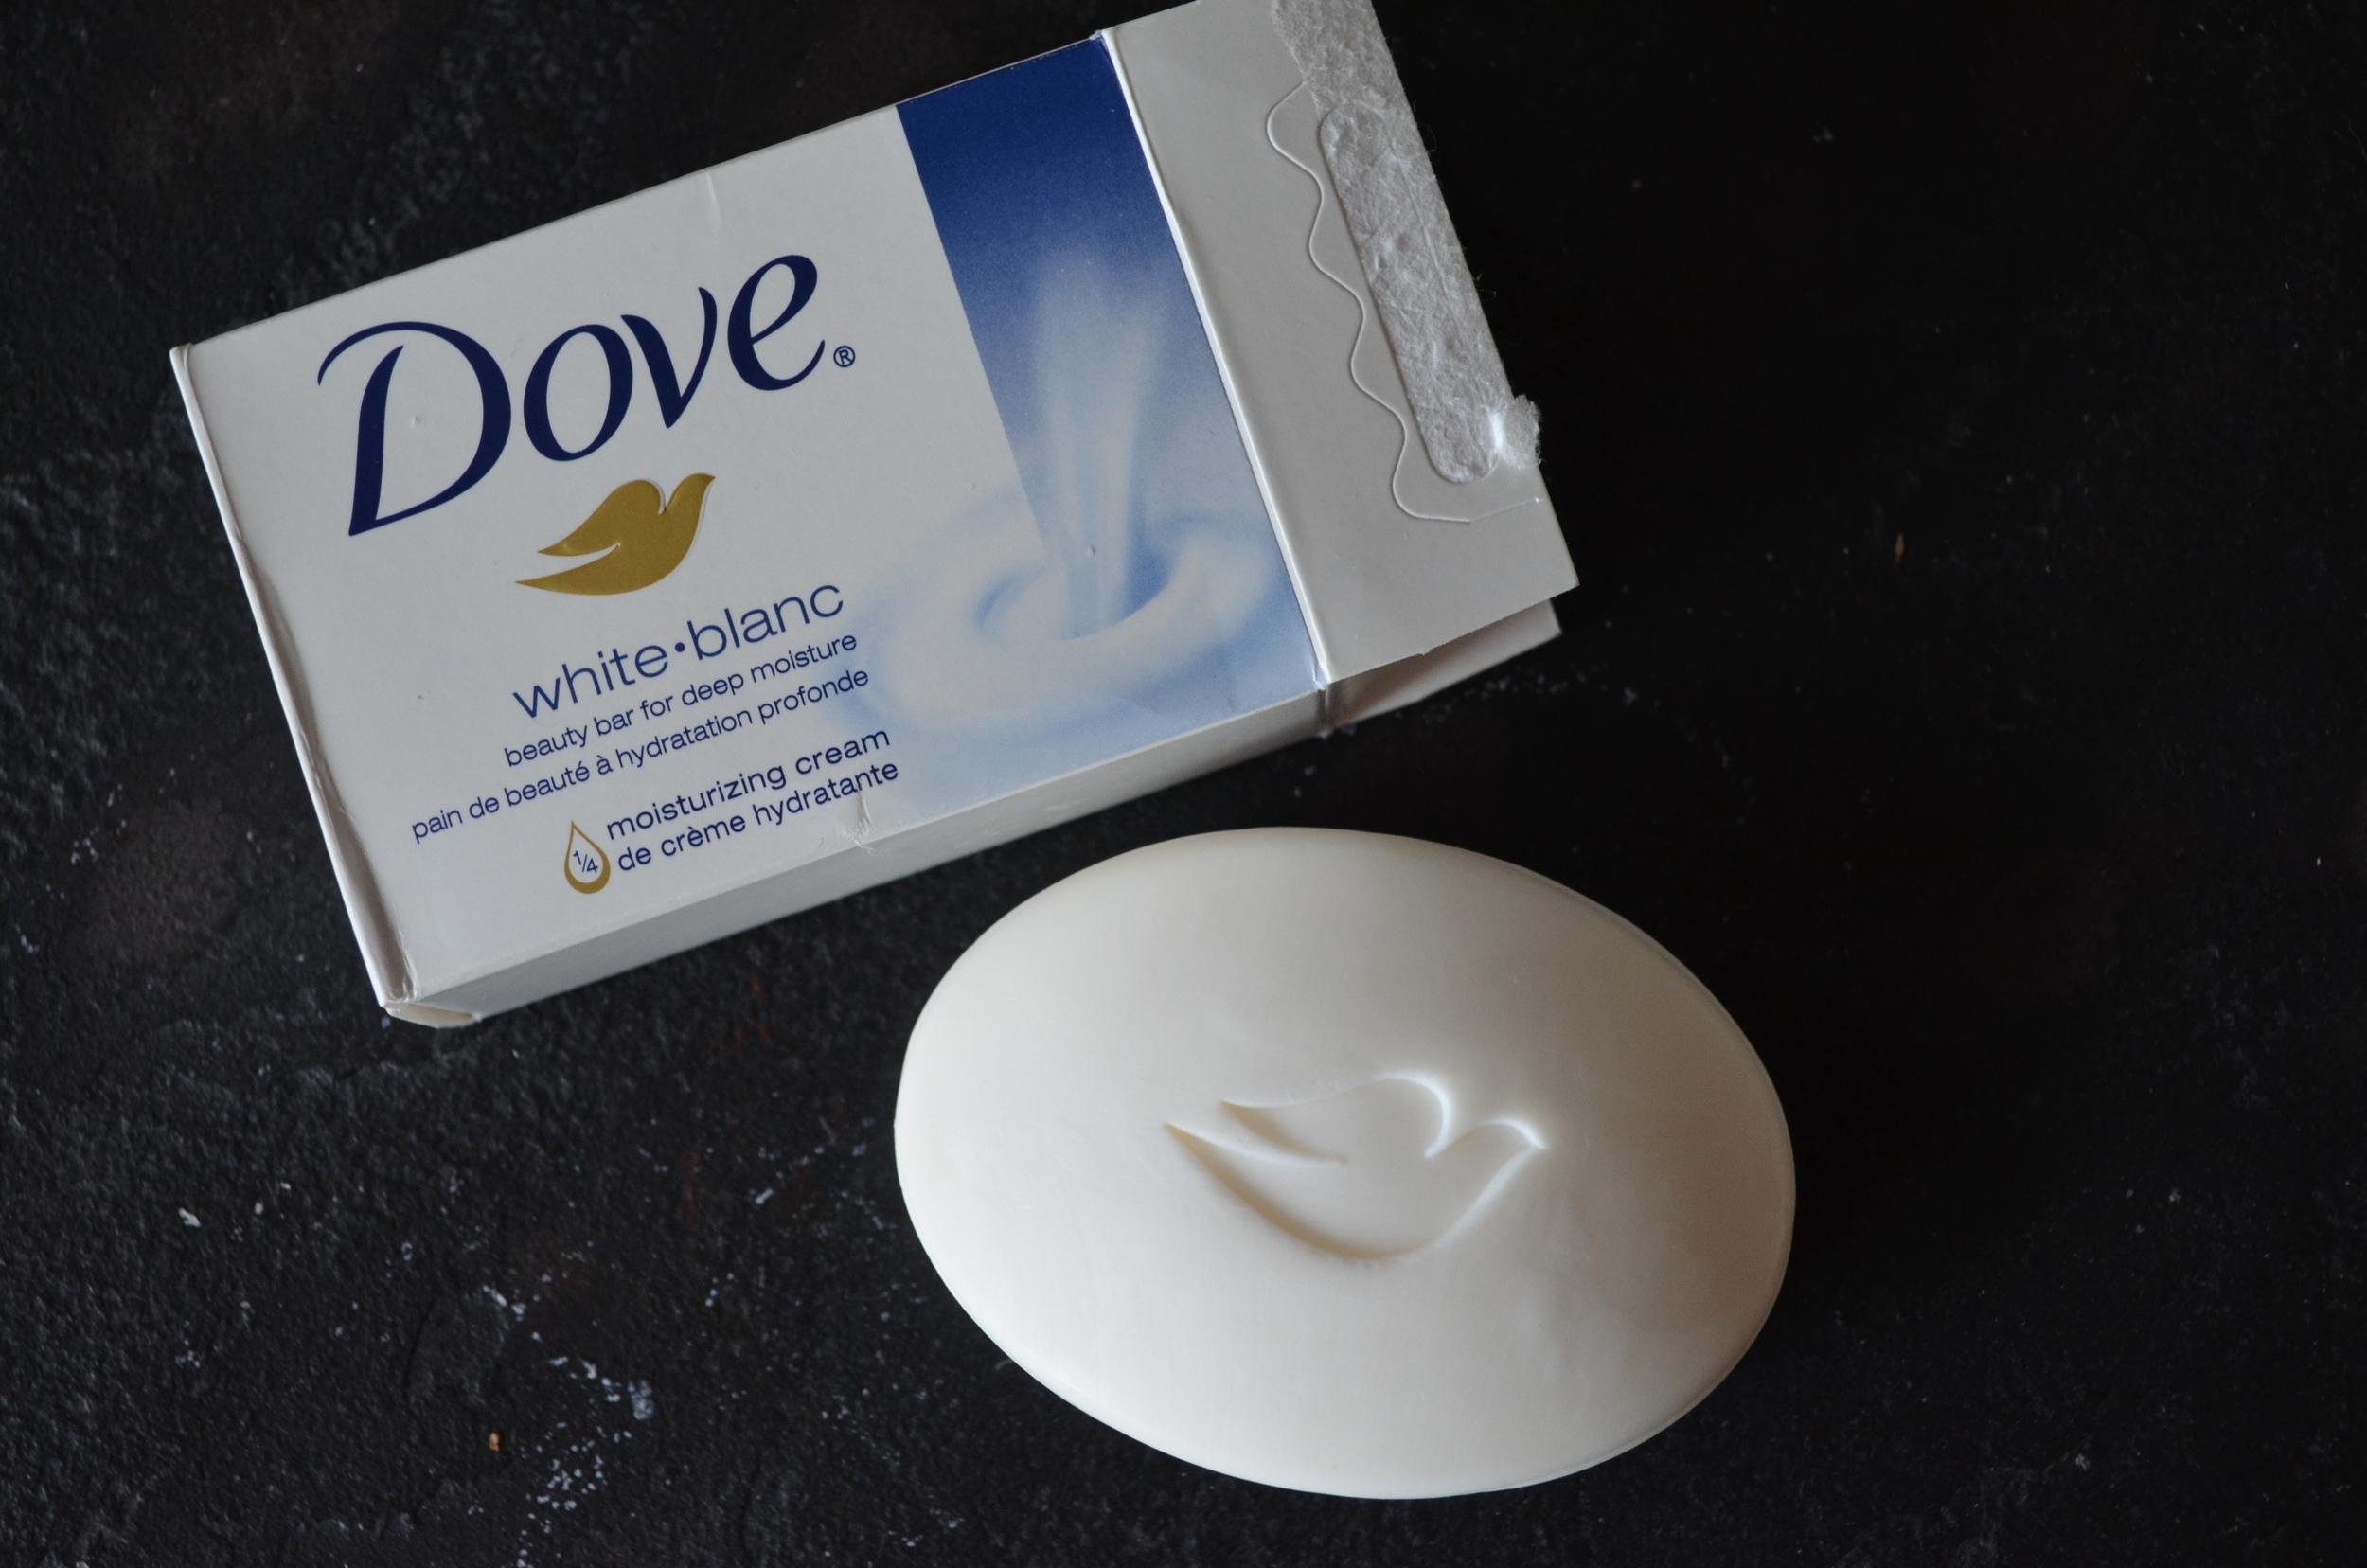 Dove makes yarn smell nice / warporweft.com